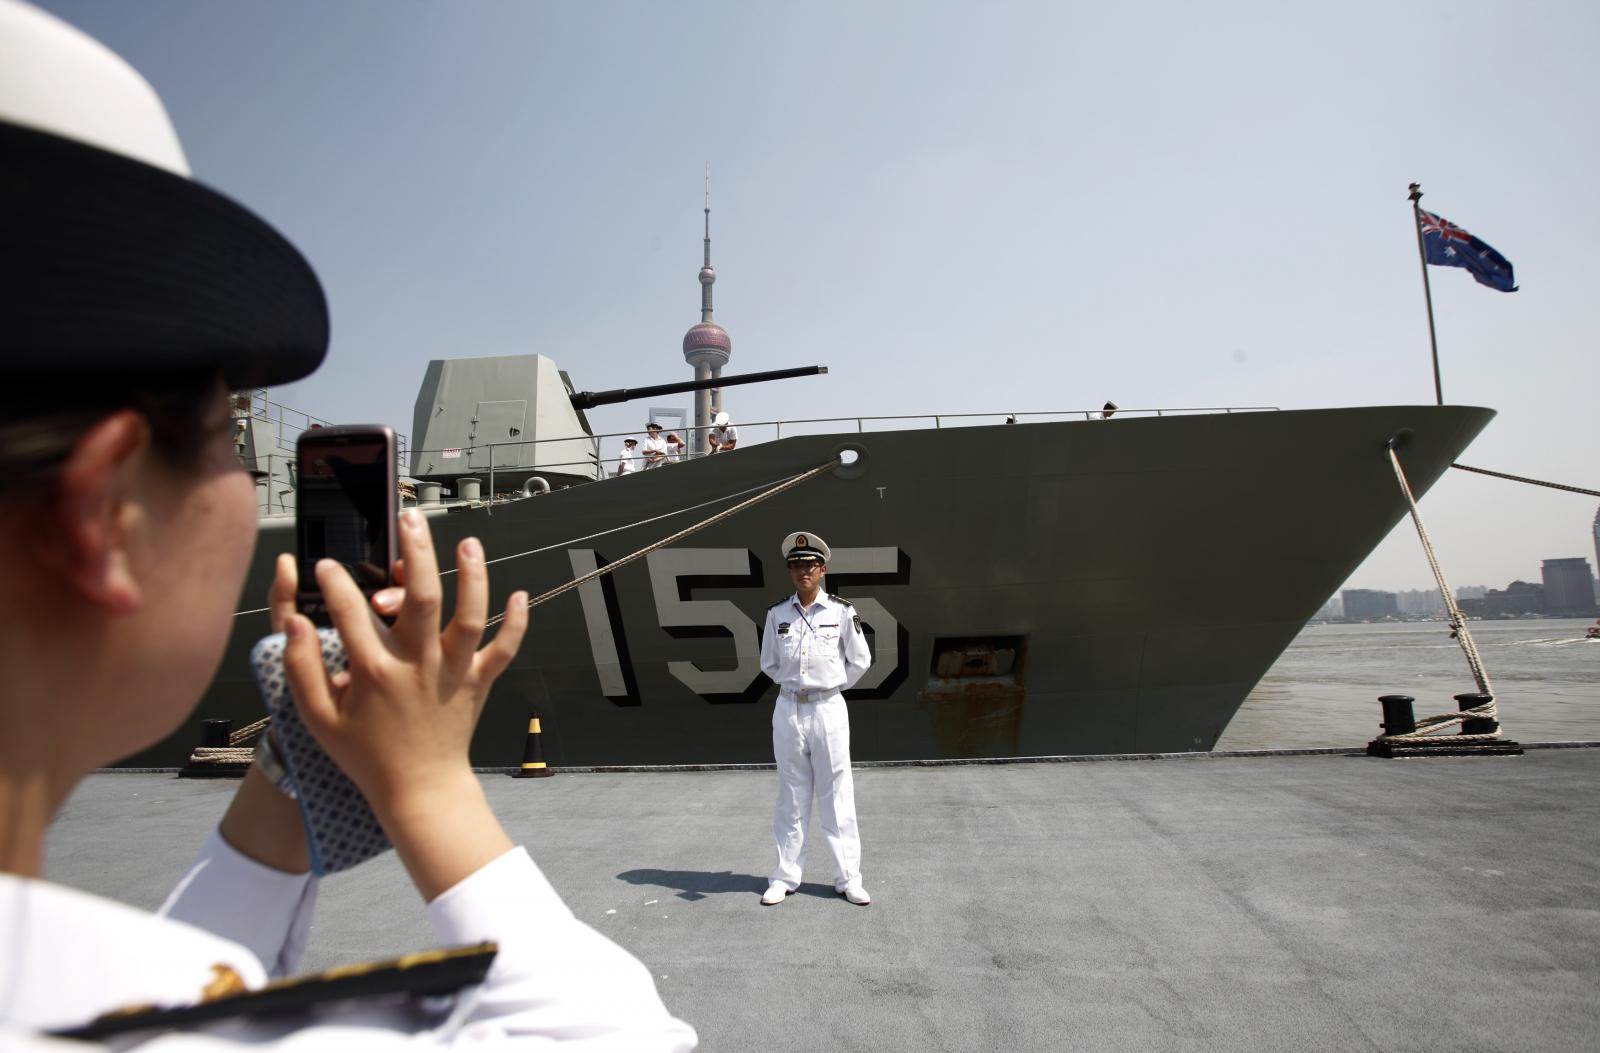 BAE Systems to build Australia navy frigates